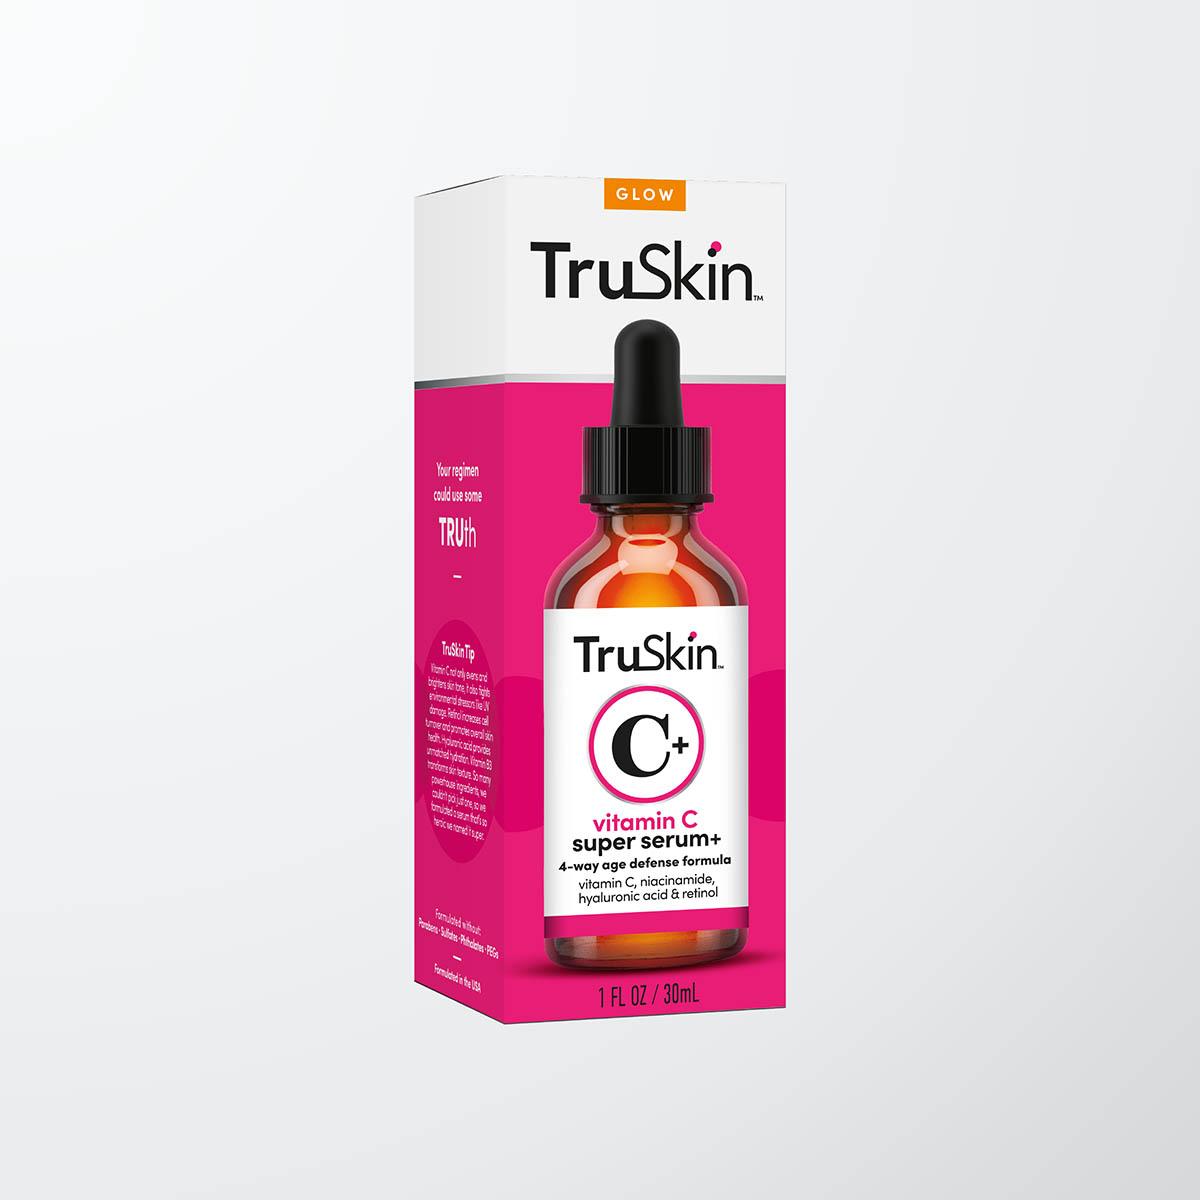 TruSkin Glow